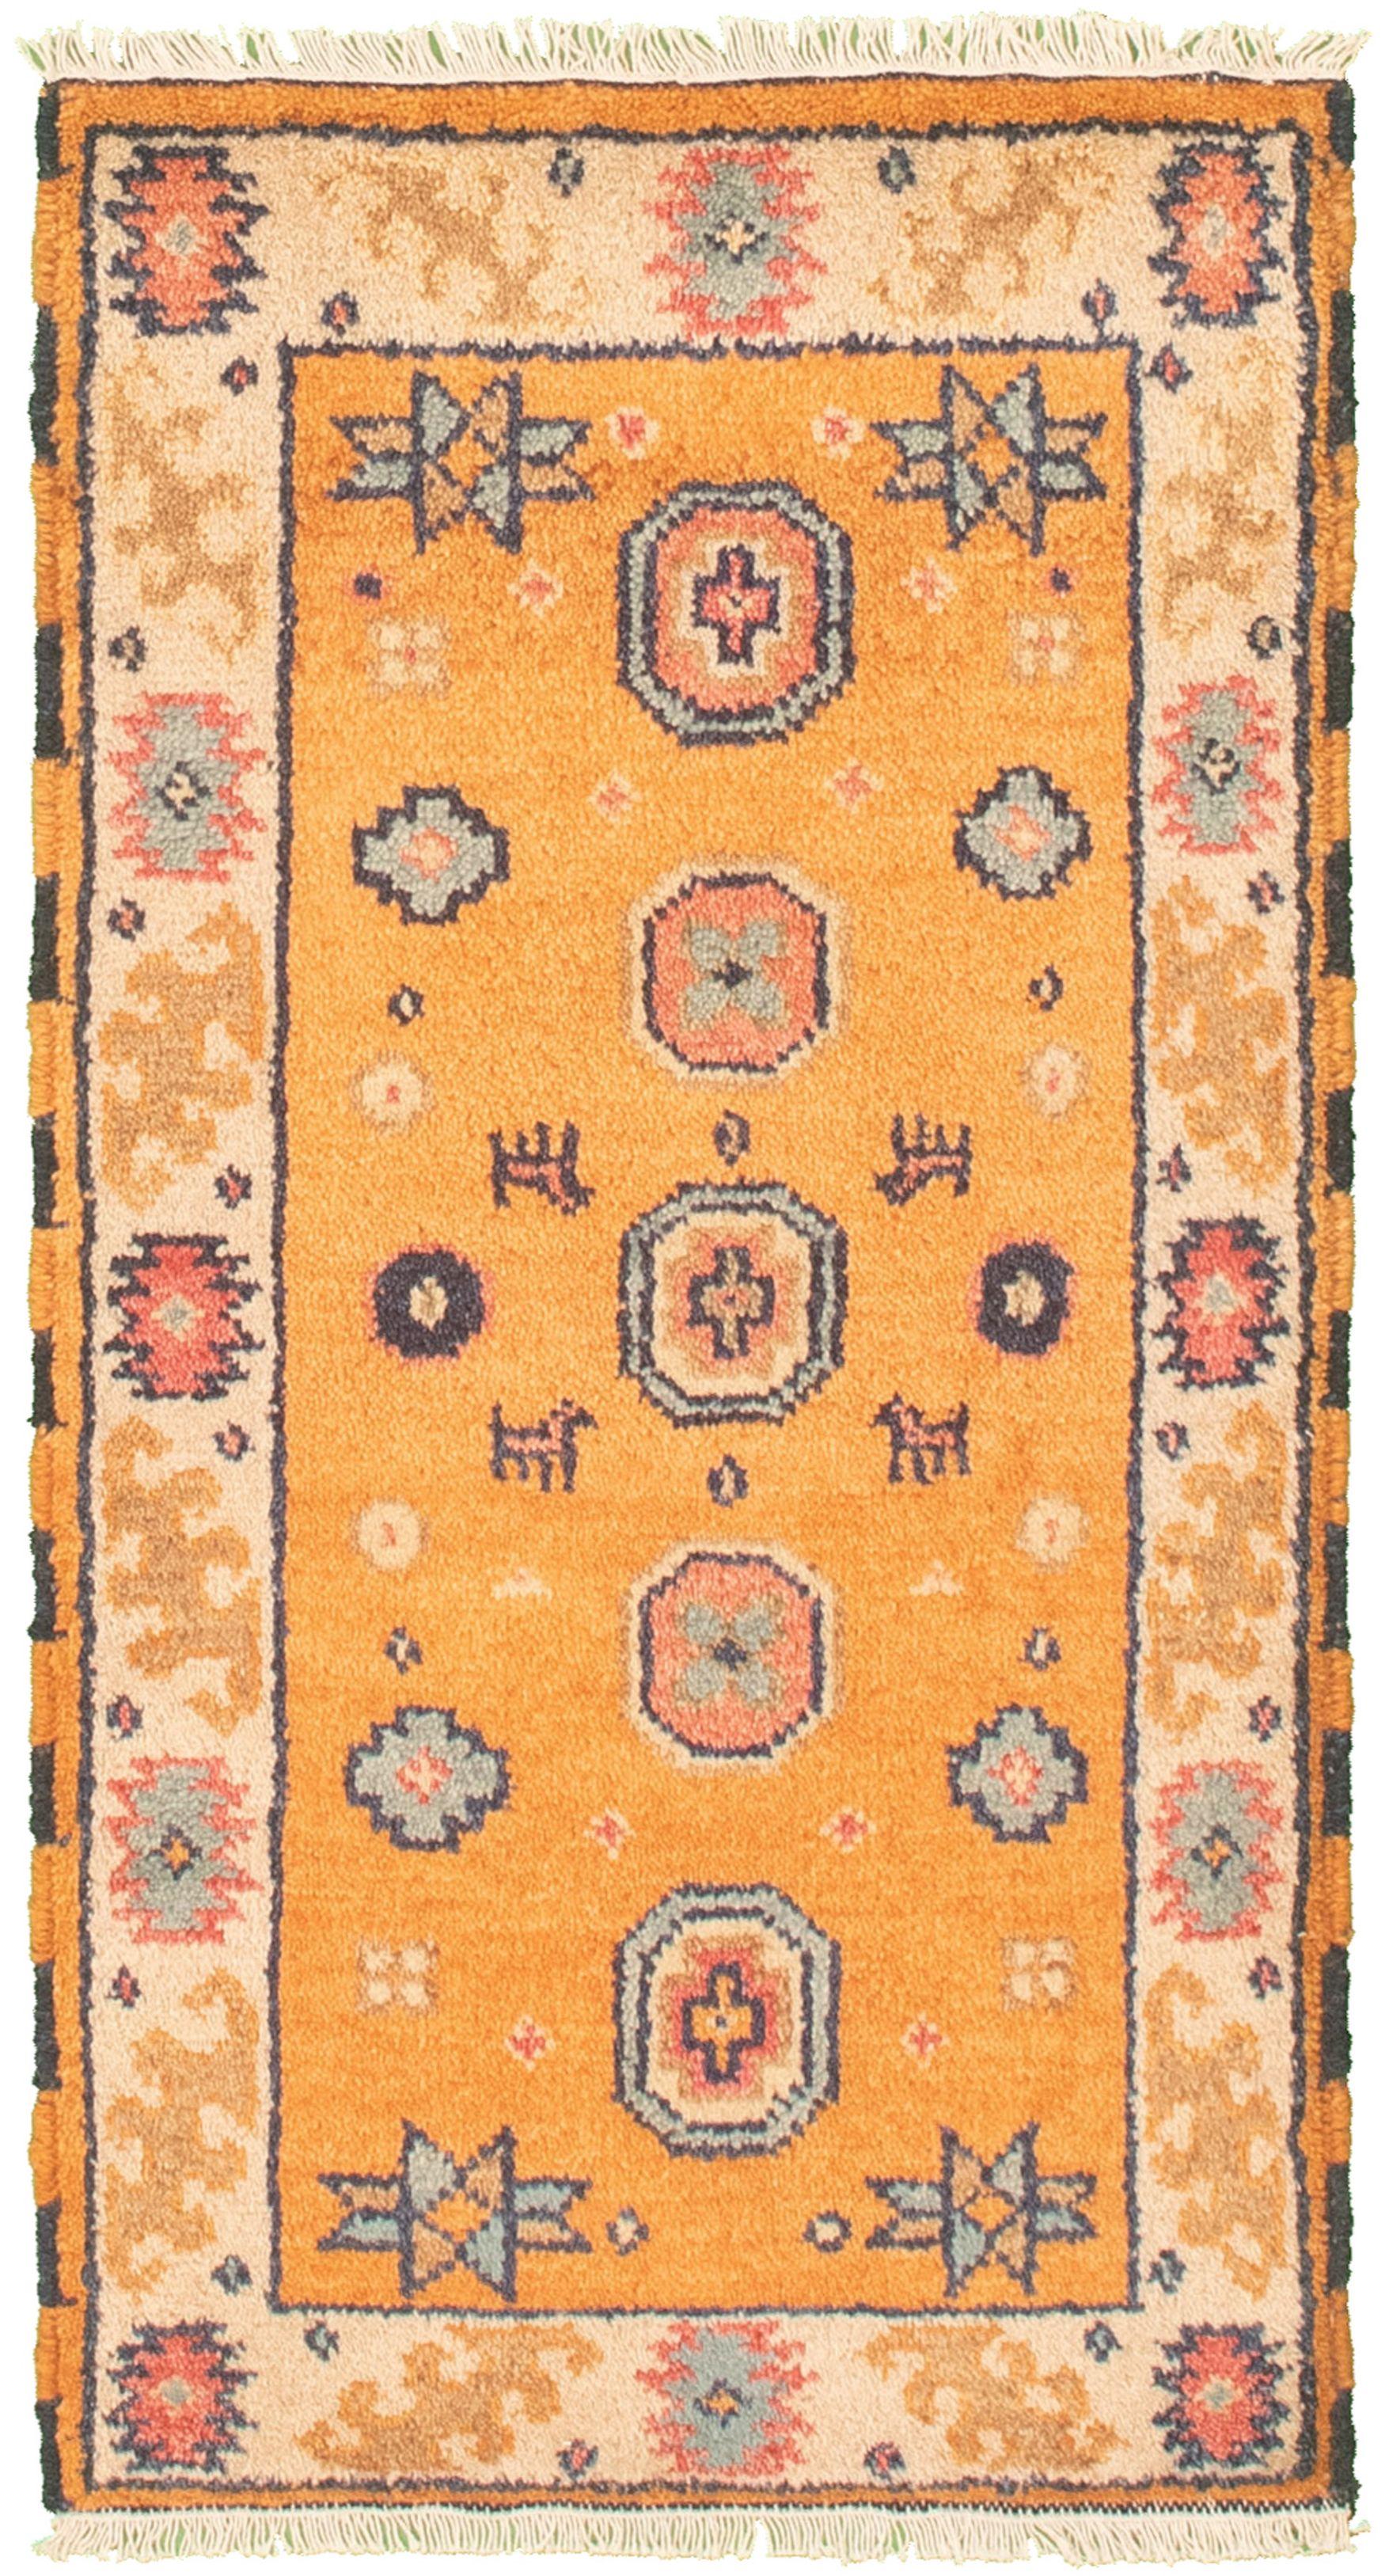 "Hand-knotted Royal Kazak Light Orange Cotton Rug 2'1"" x 4'0""  Size: 2'1"" x 4'0"""